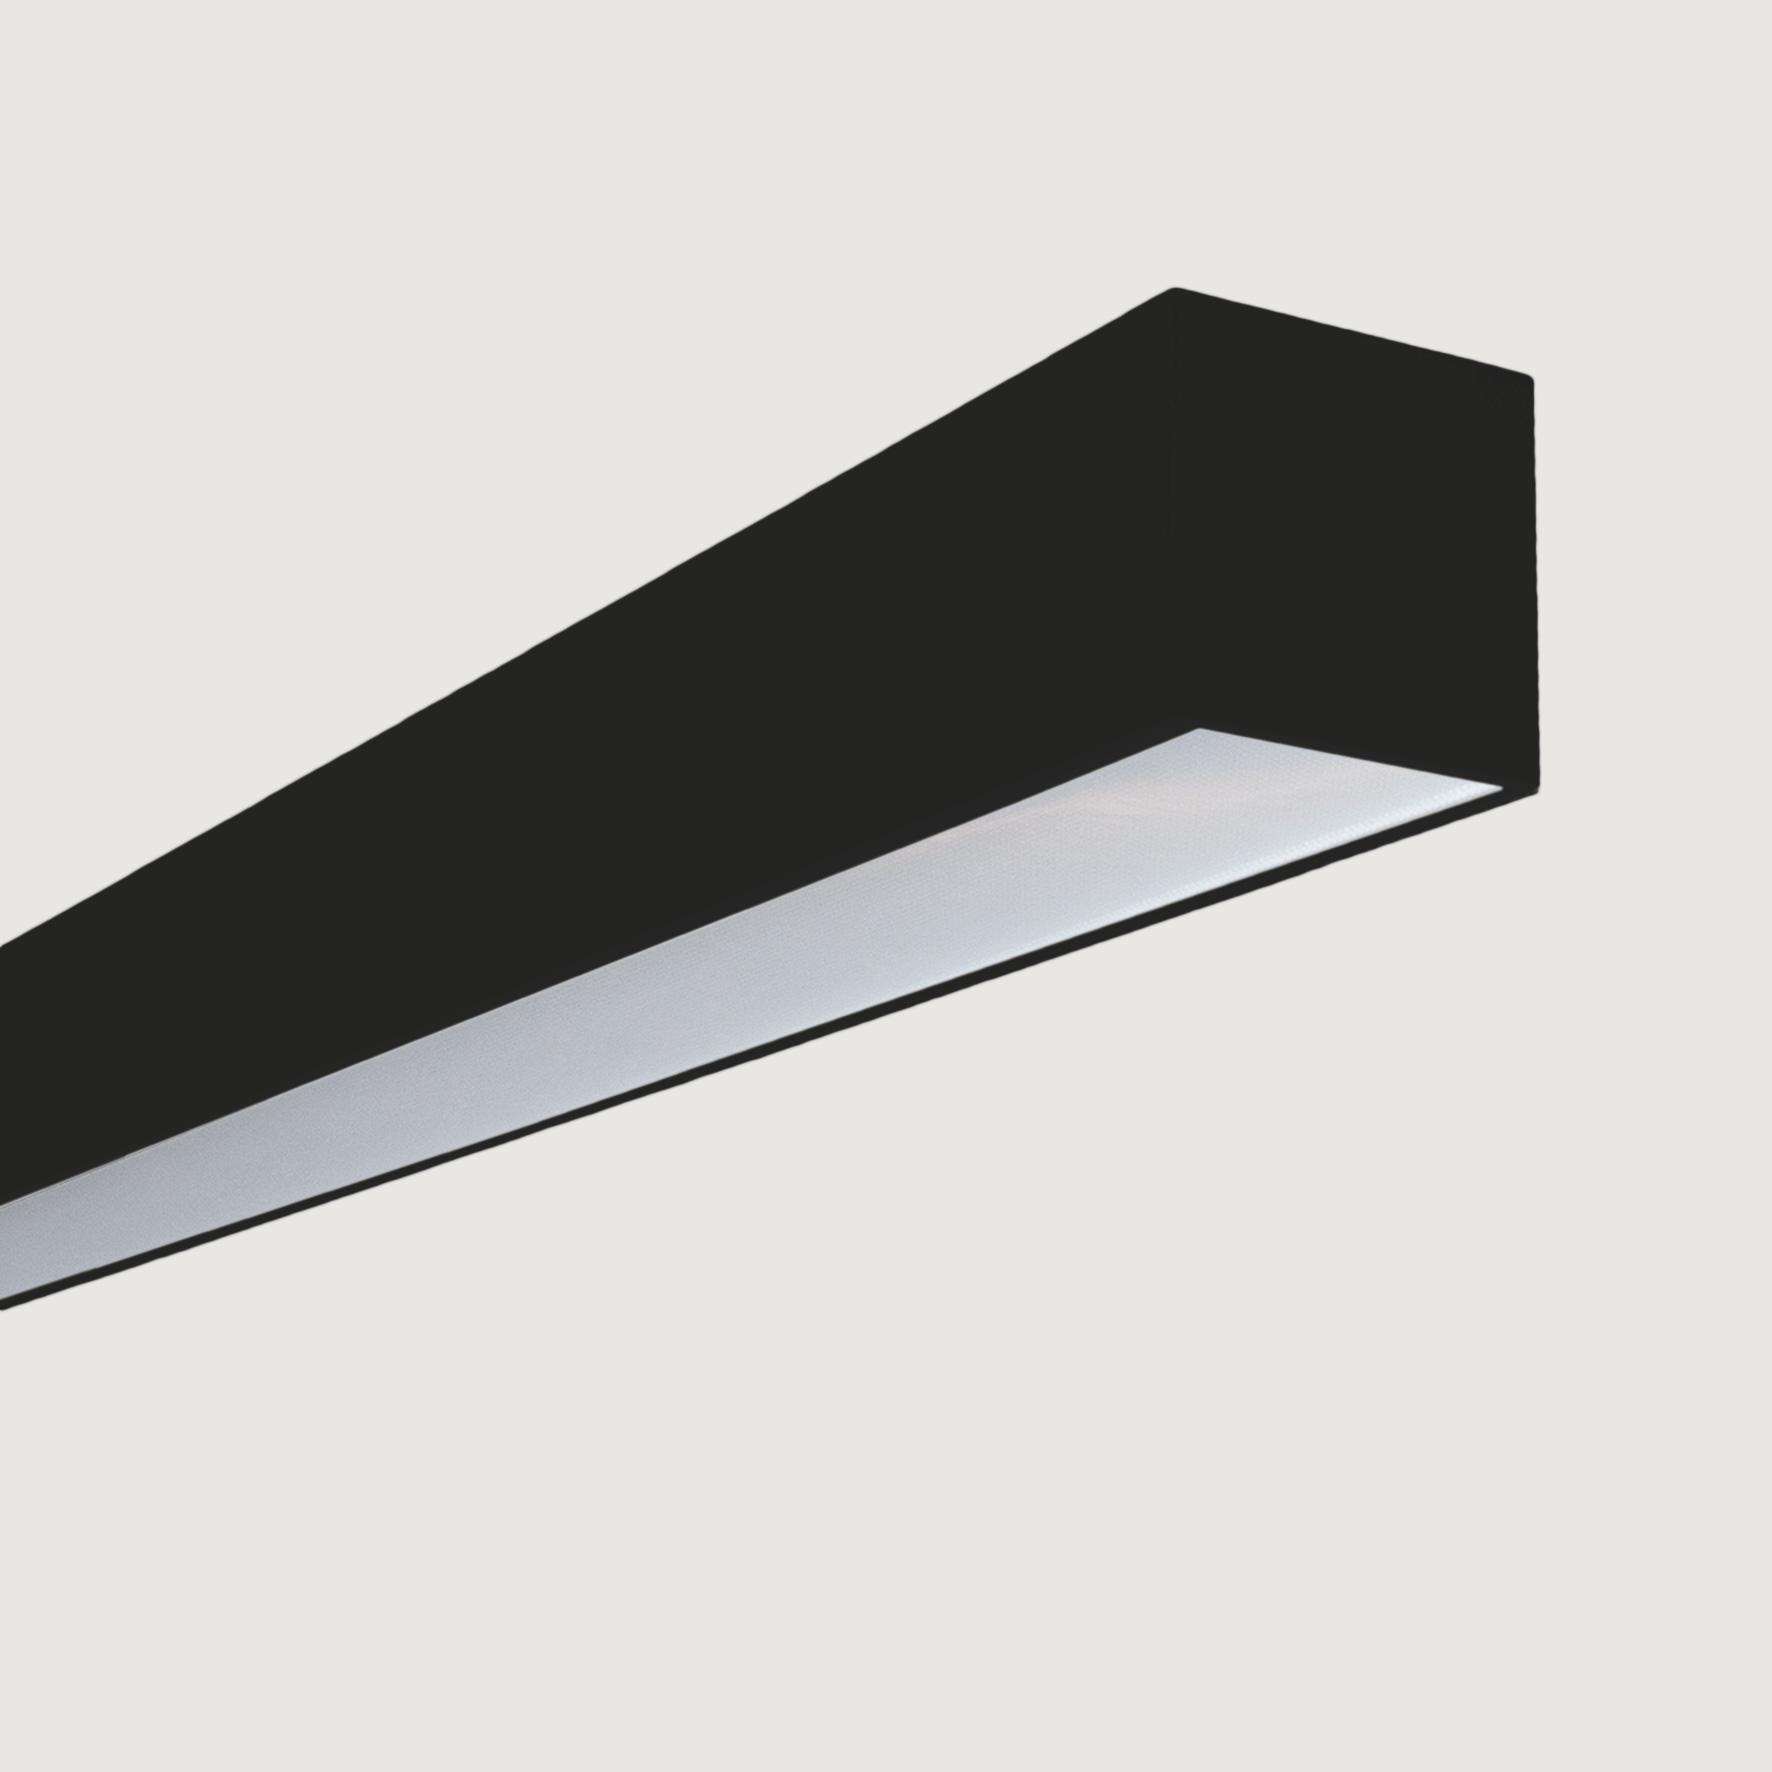 SL85-profilleuchte-schwarz-sml-led-1